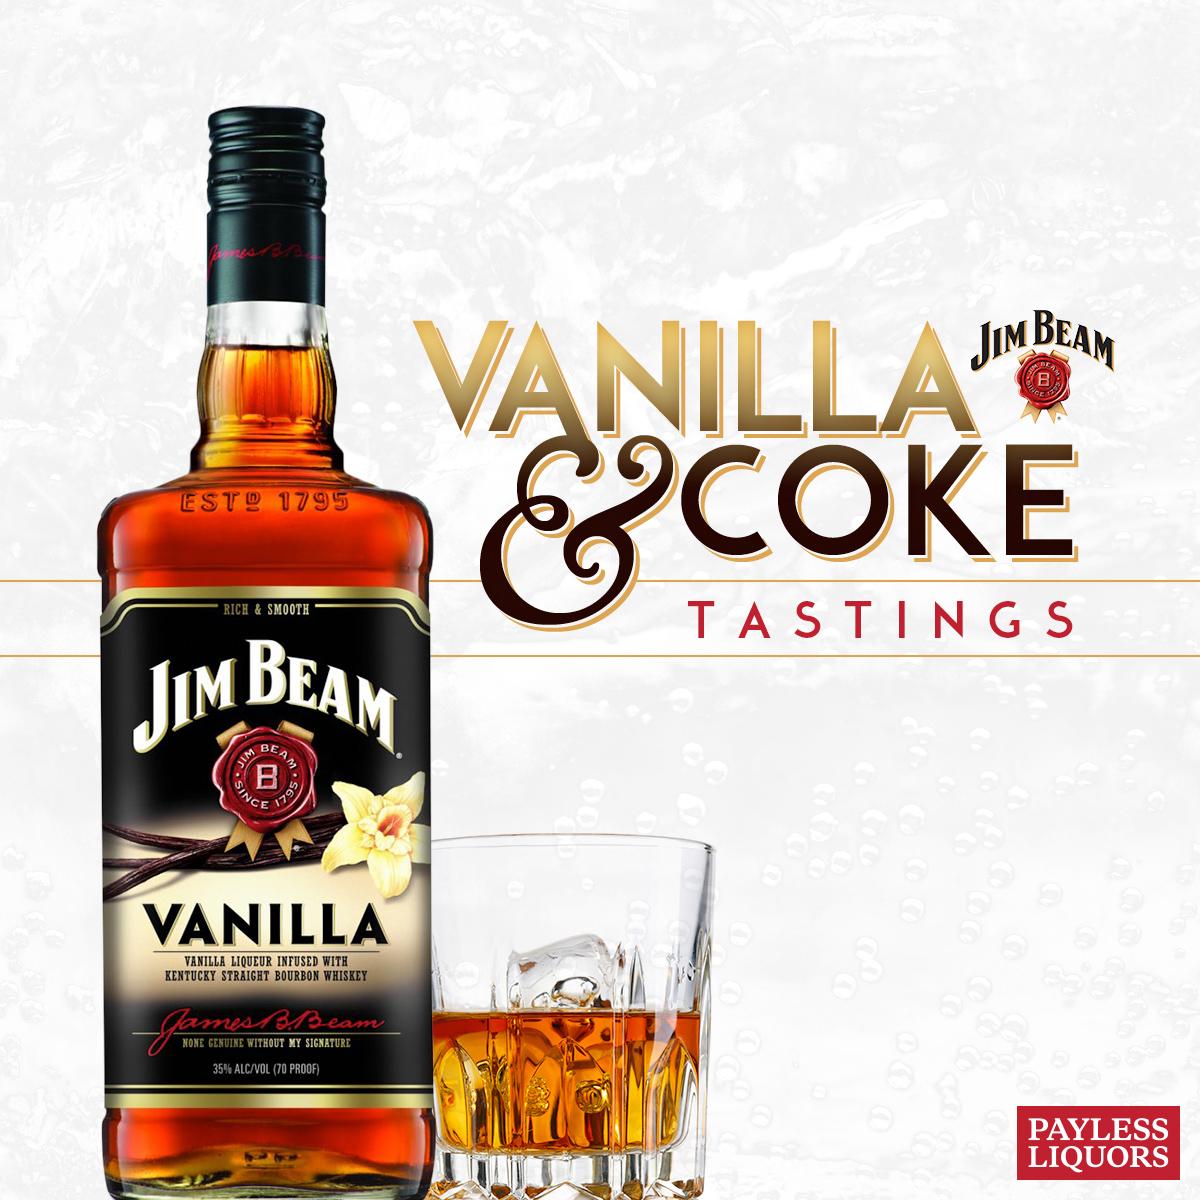 PL-JBVanilla_Coke-Tastings-2017-FBPP-1